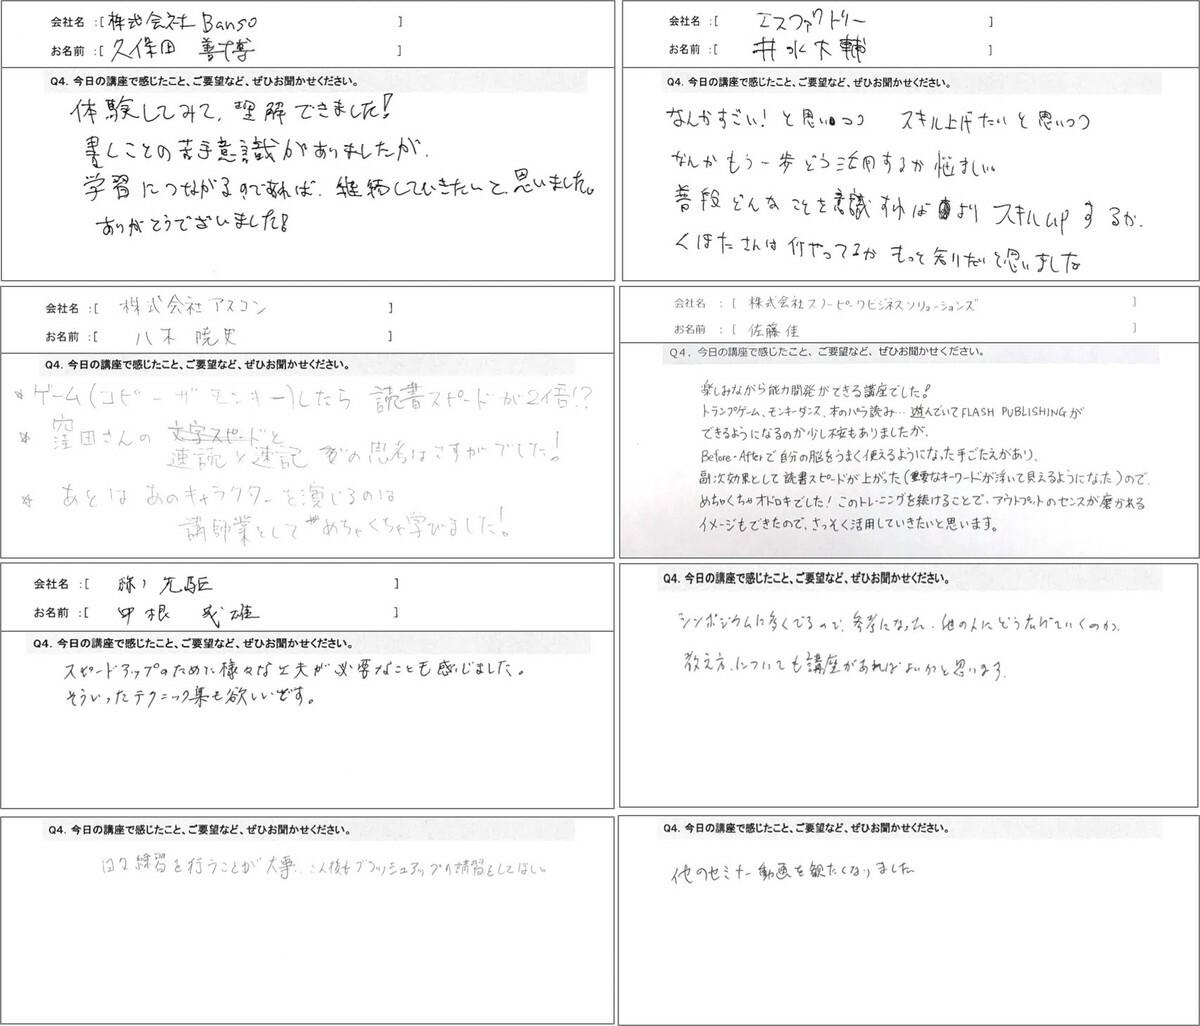 4245_normal_1571475334_アンケート結果(手書き).jpg